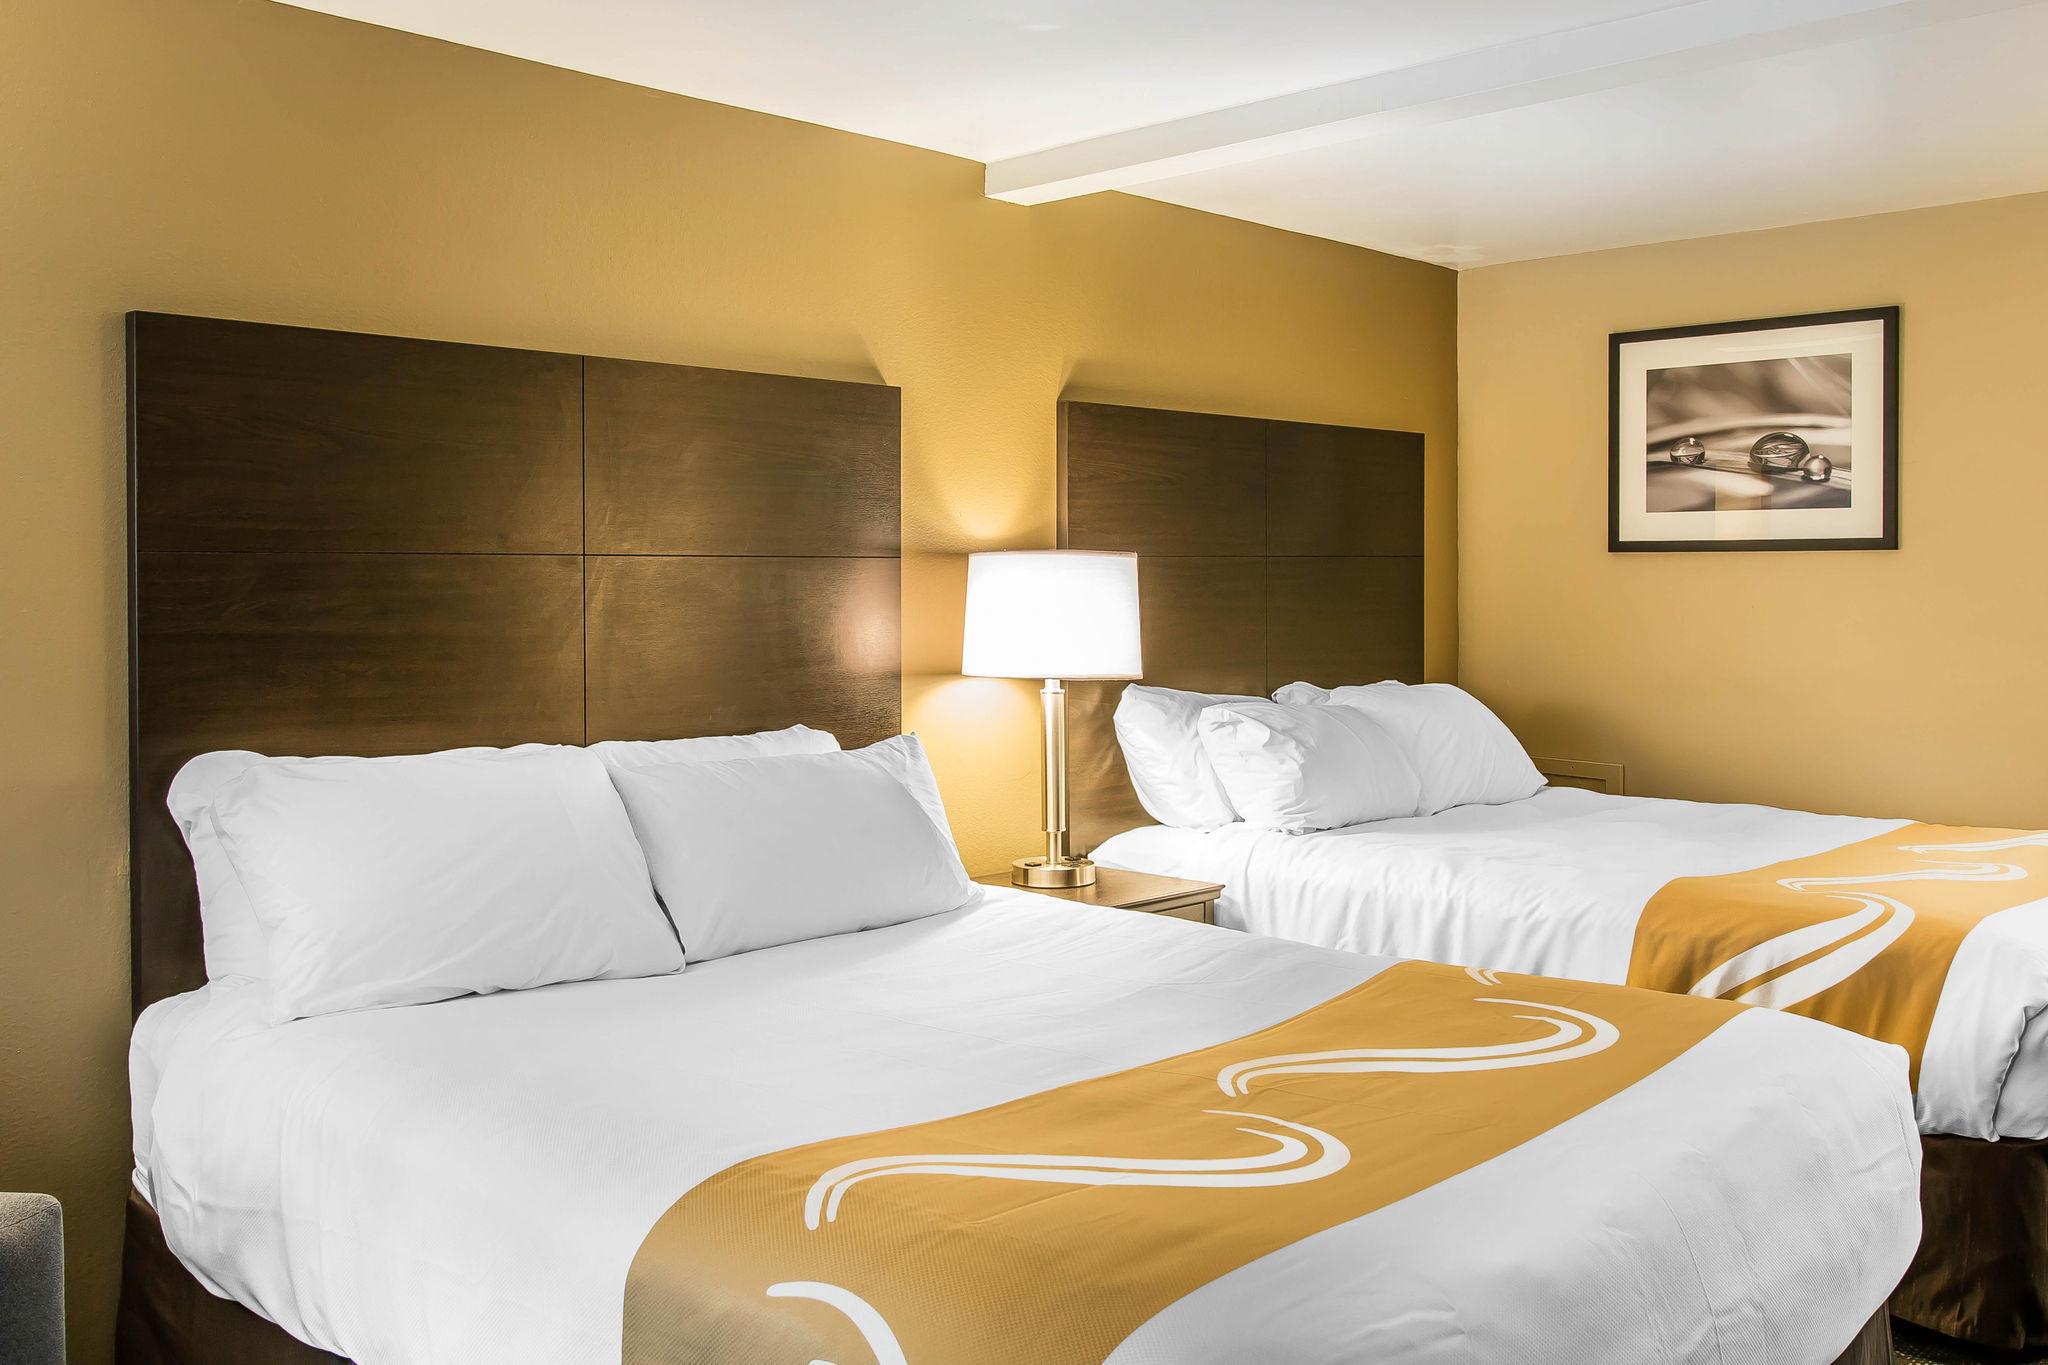 Quality Inn & Suites, Houghton MI